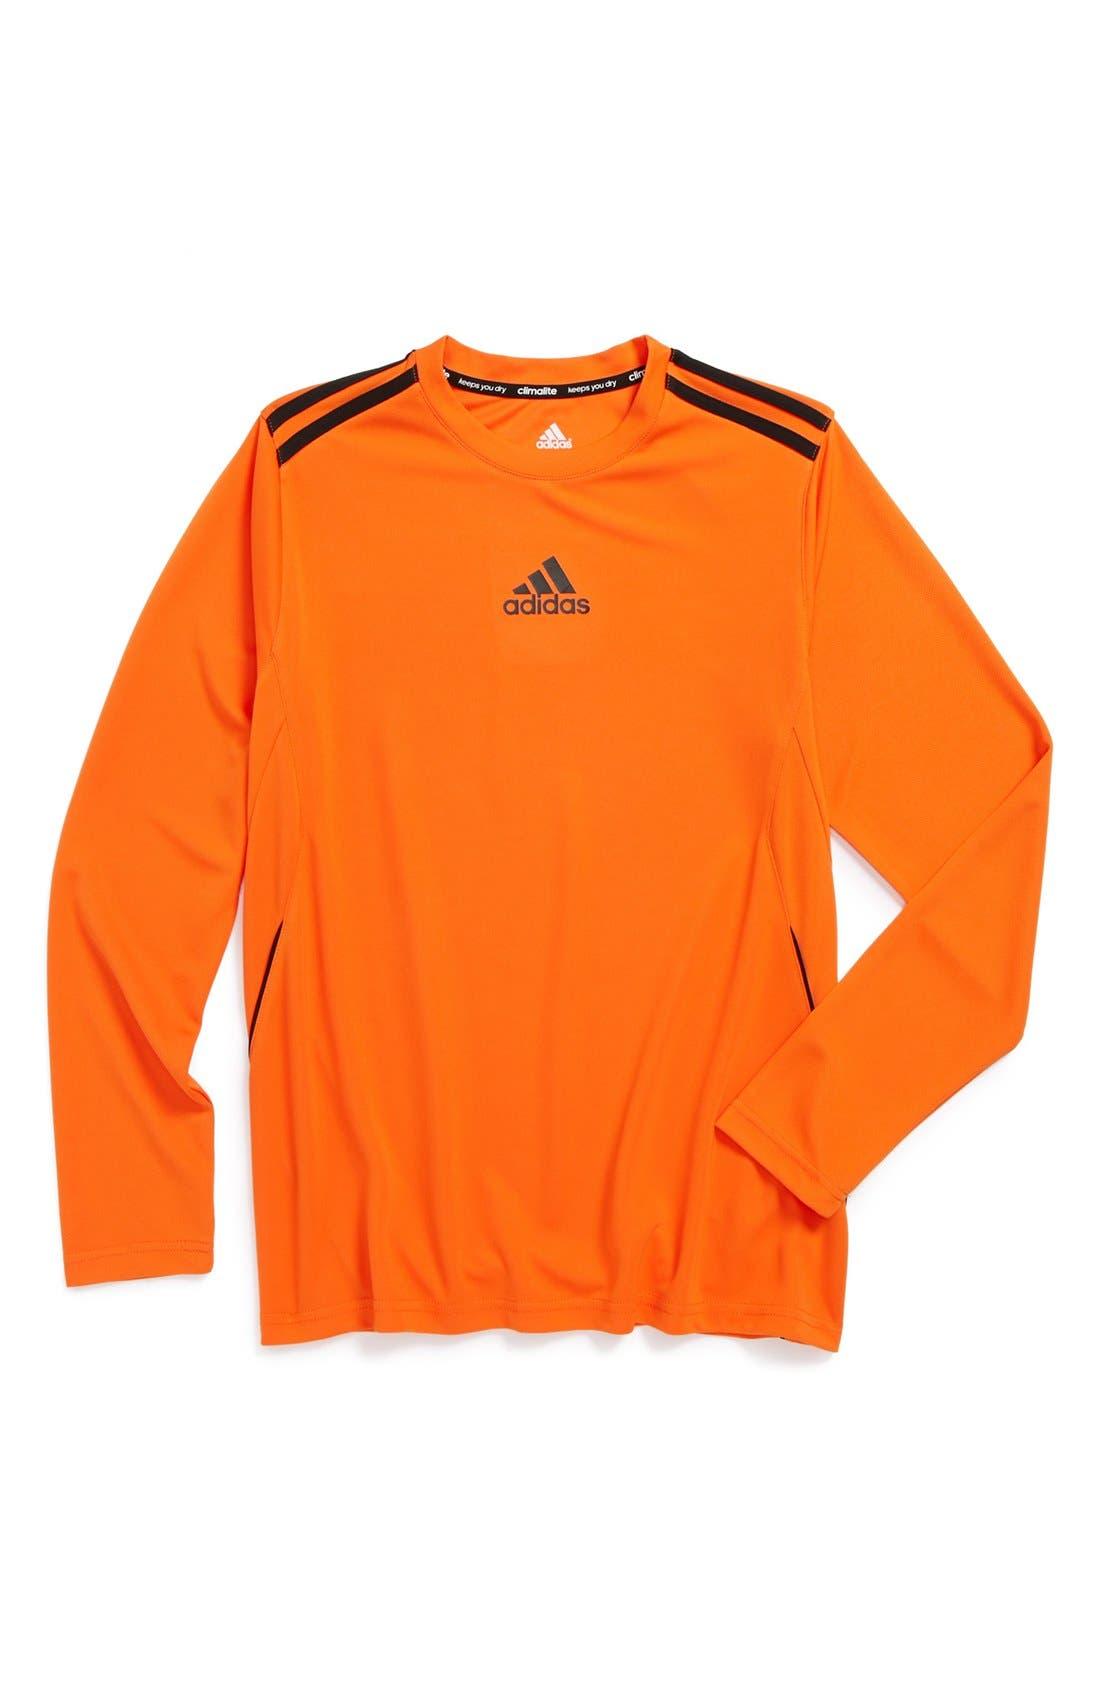 Alternate Image 1 Selected - adidas ClimaCore Long Sleeve Shirt (Big Boys)